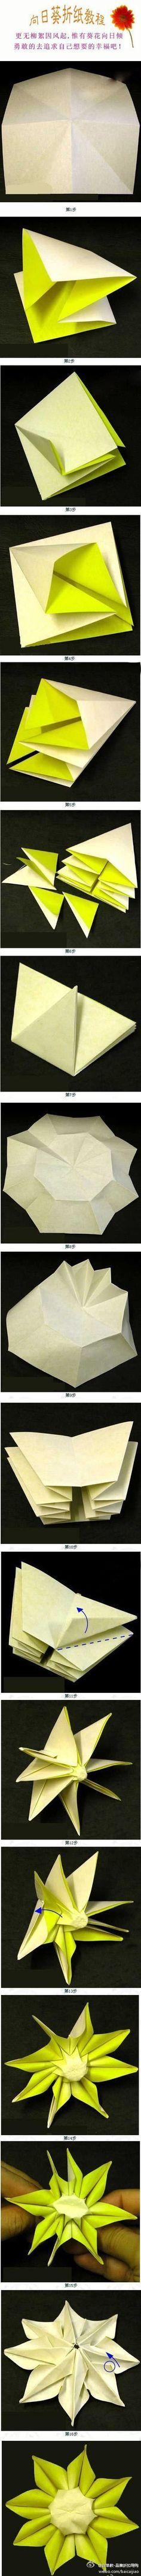 Paper sunflower origami